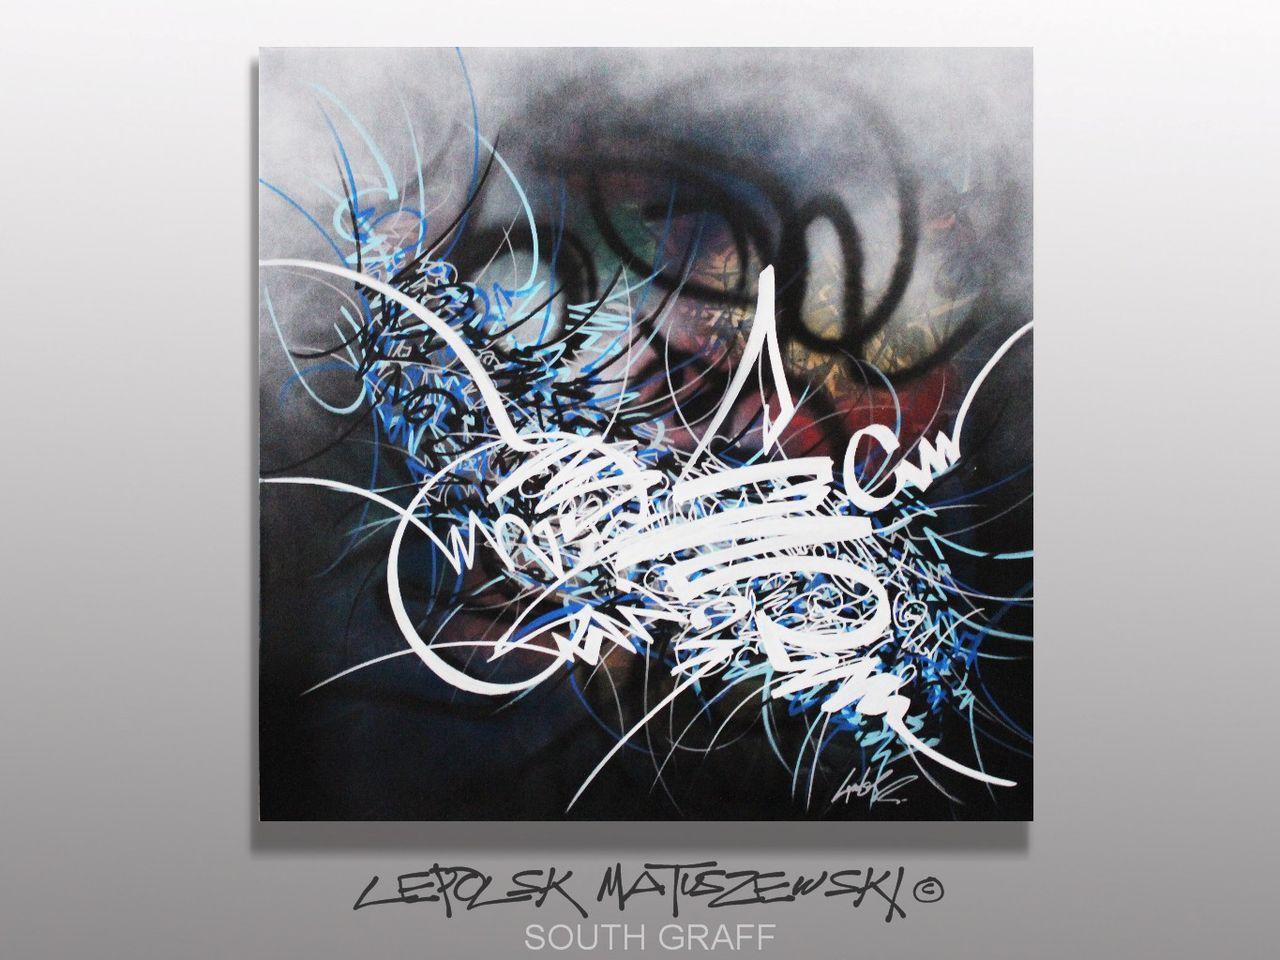 MISTER K  (Lepolsk Matuszewski) SOUTH GRAFF  street art calligraffiti graffiti abstrait